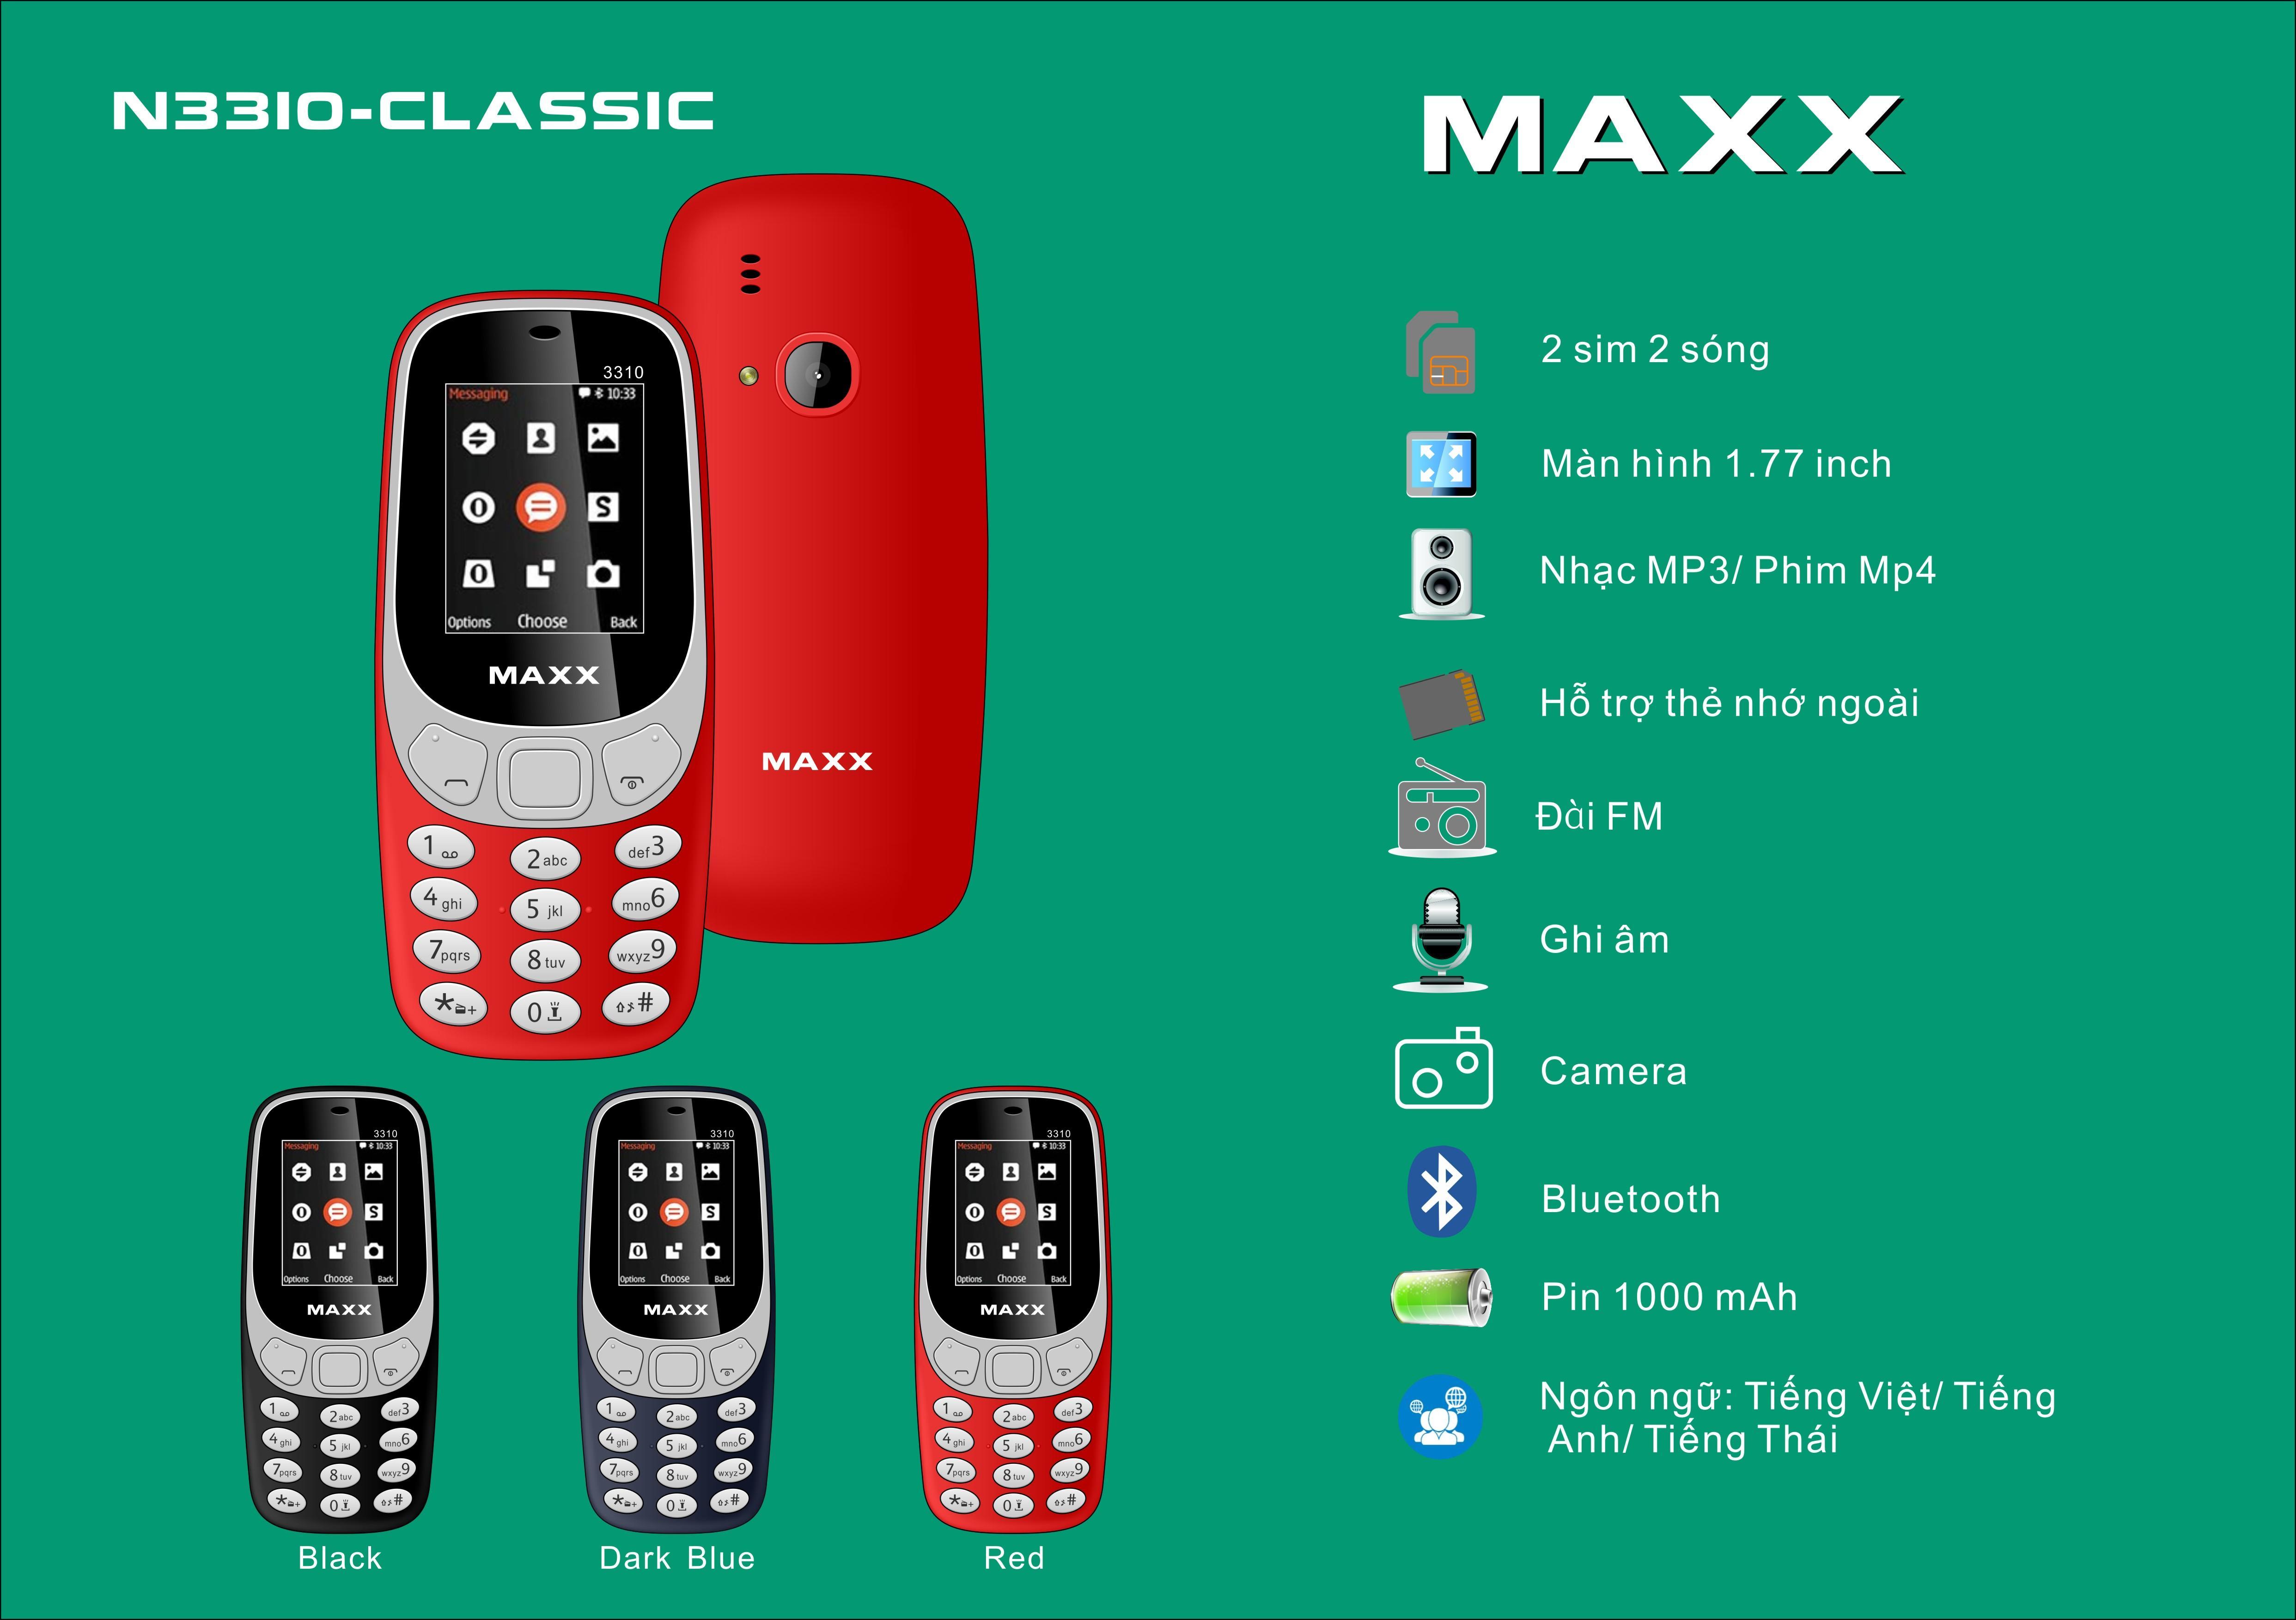 MAXX-N3310.jpg